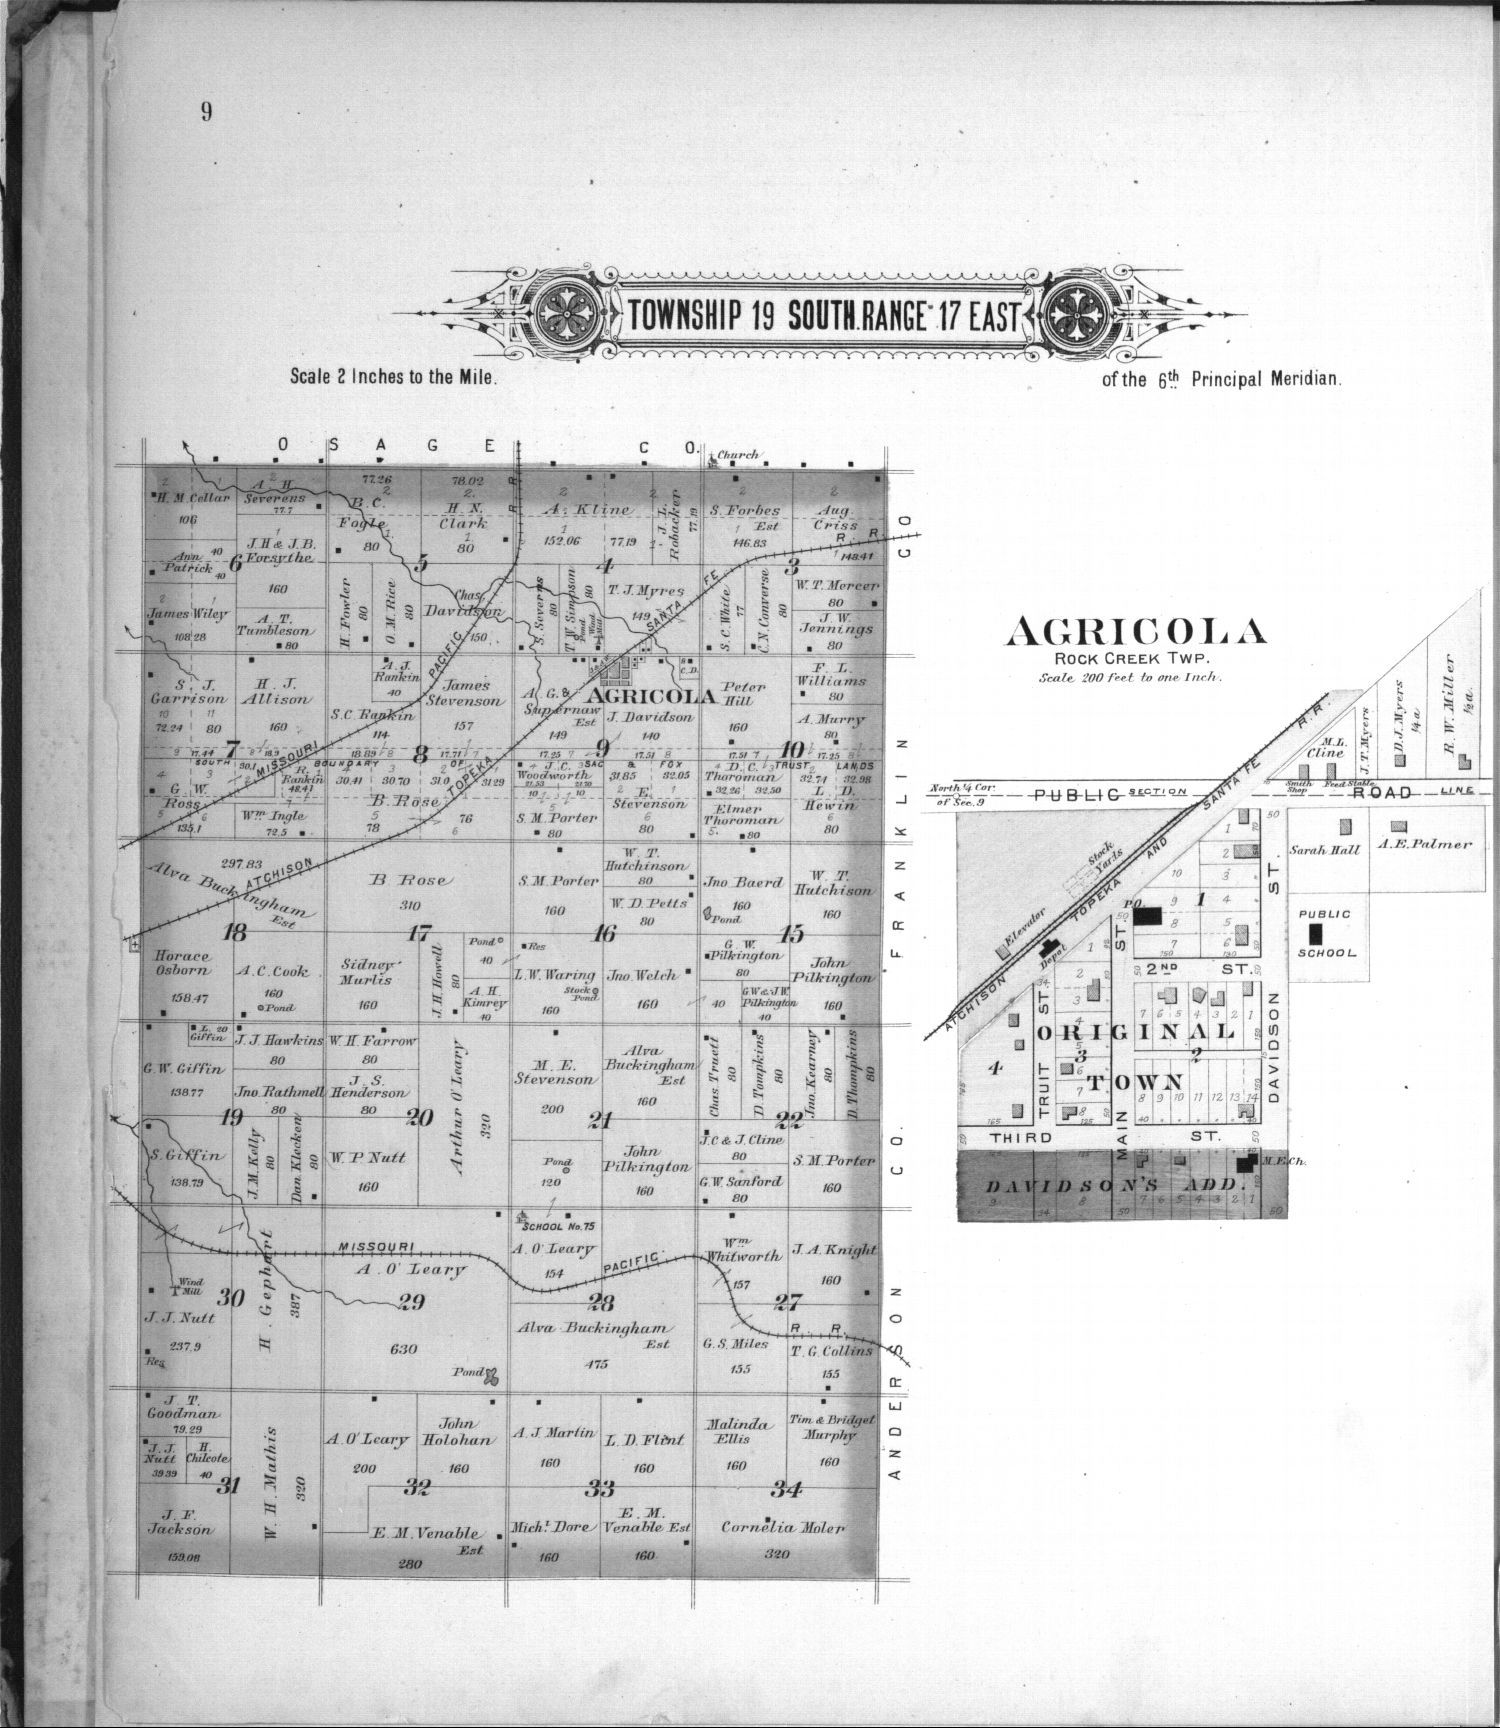 Plat book, Coffey County, Kansas - 9